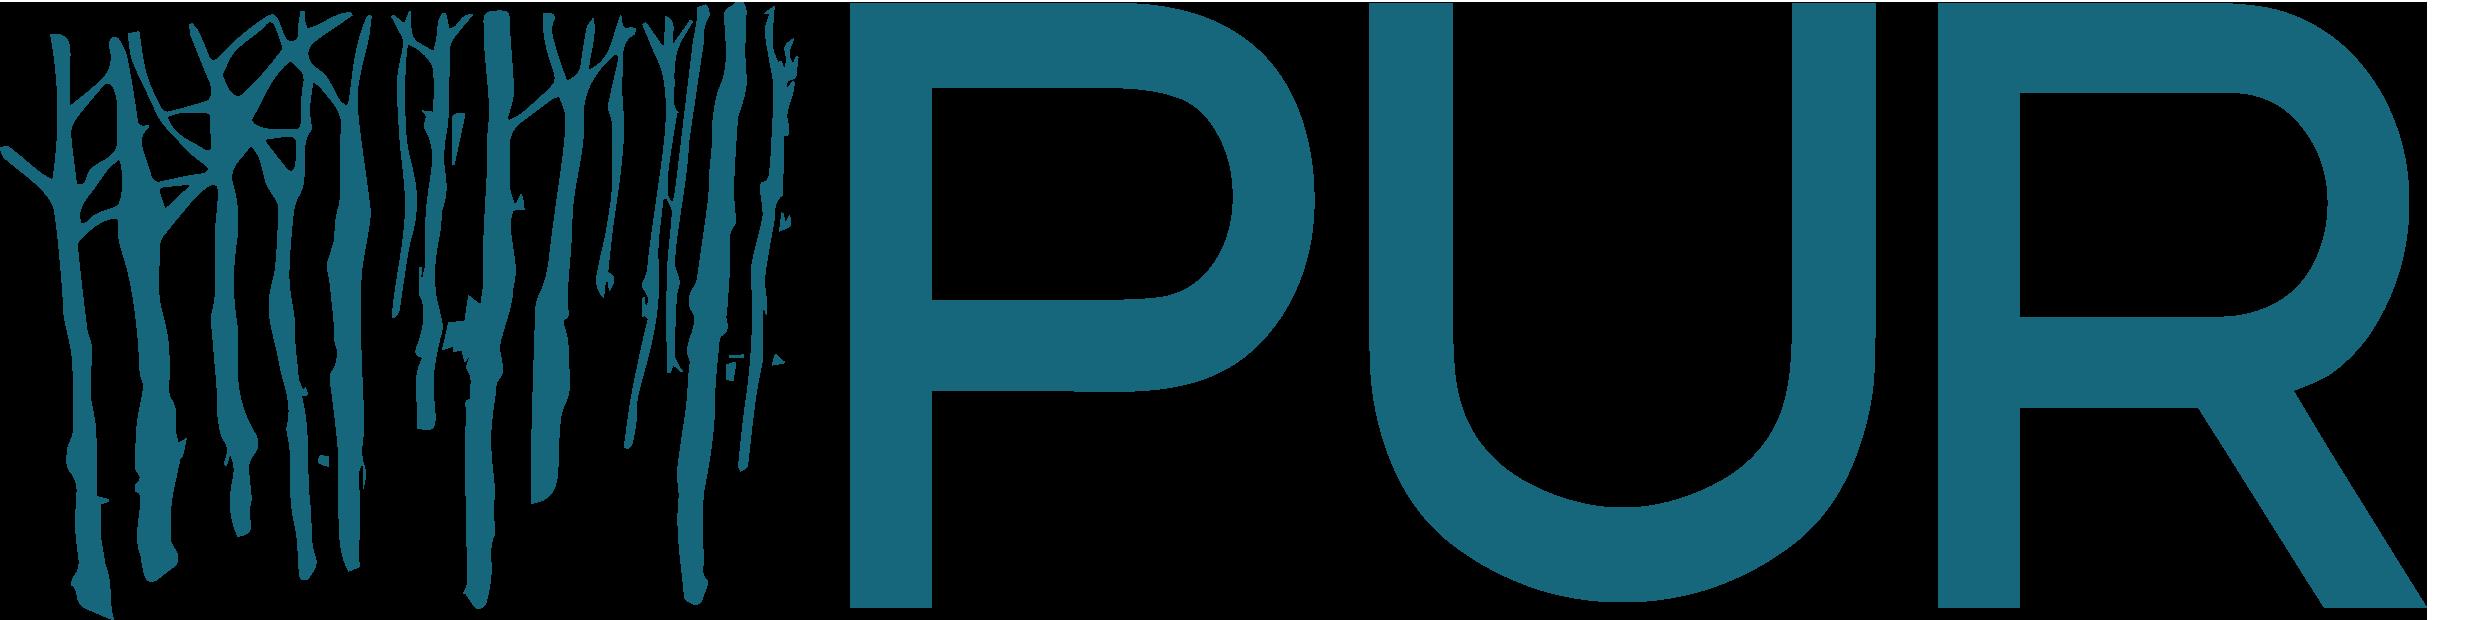 Pur Projet logo